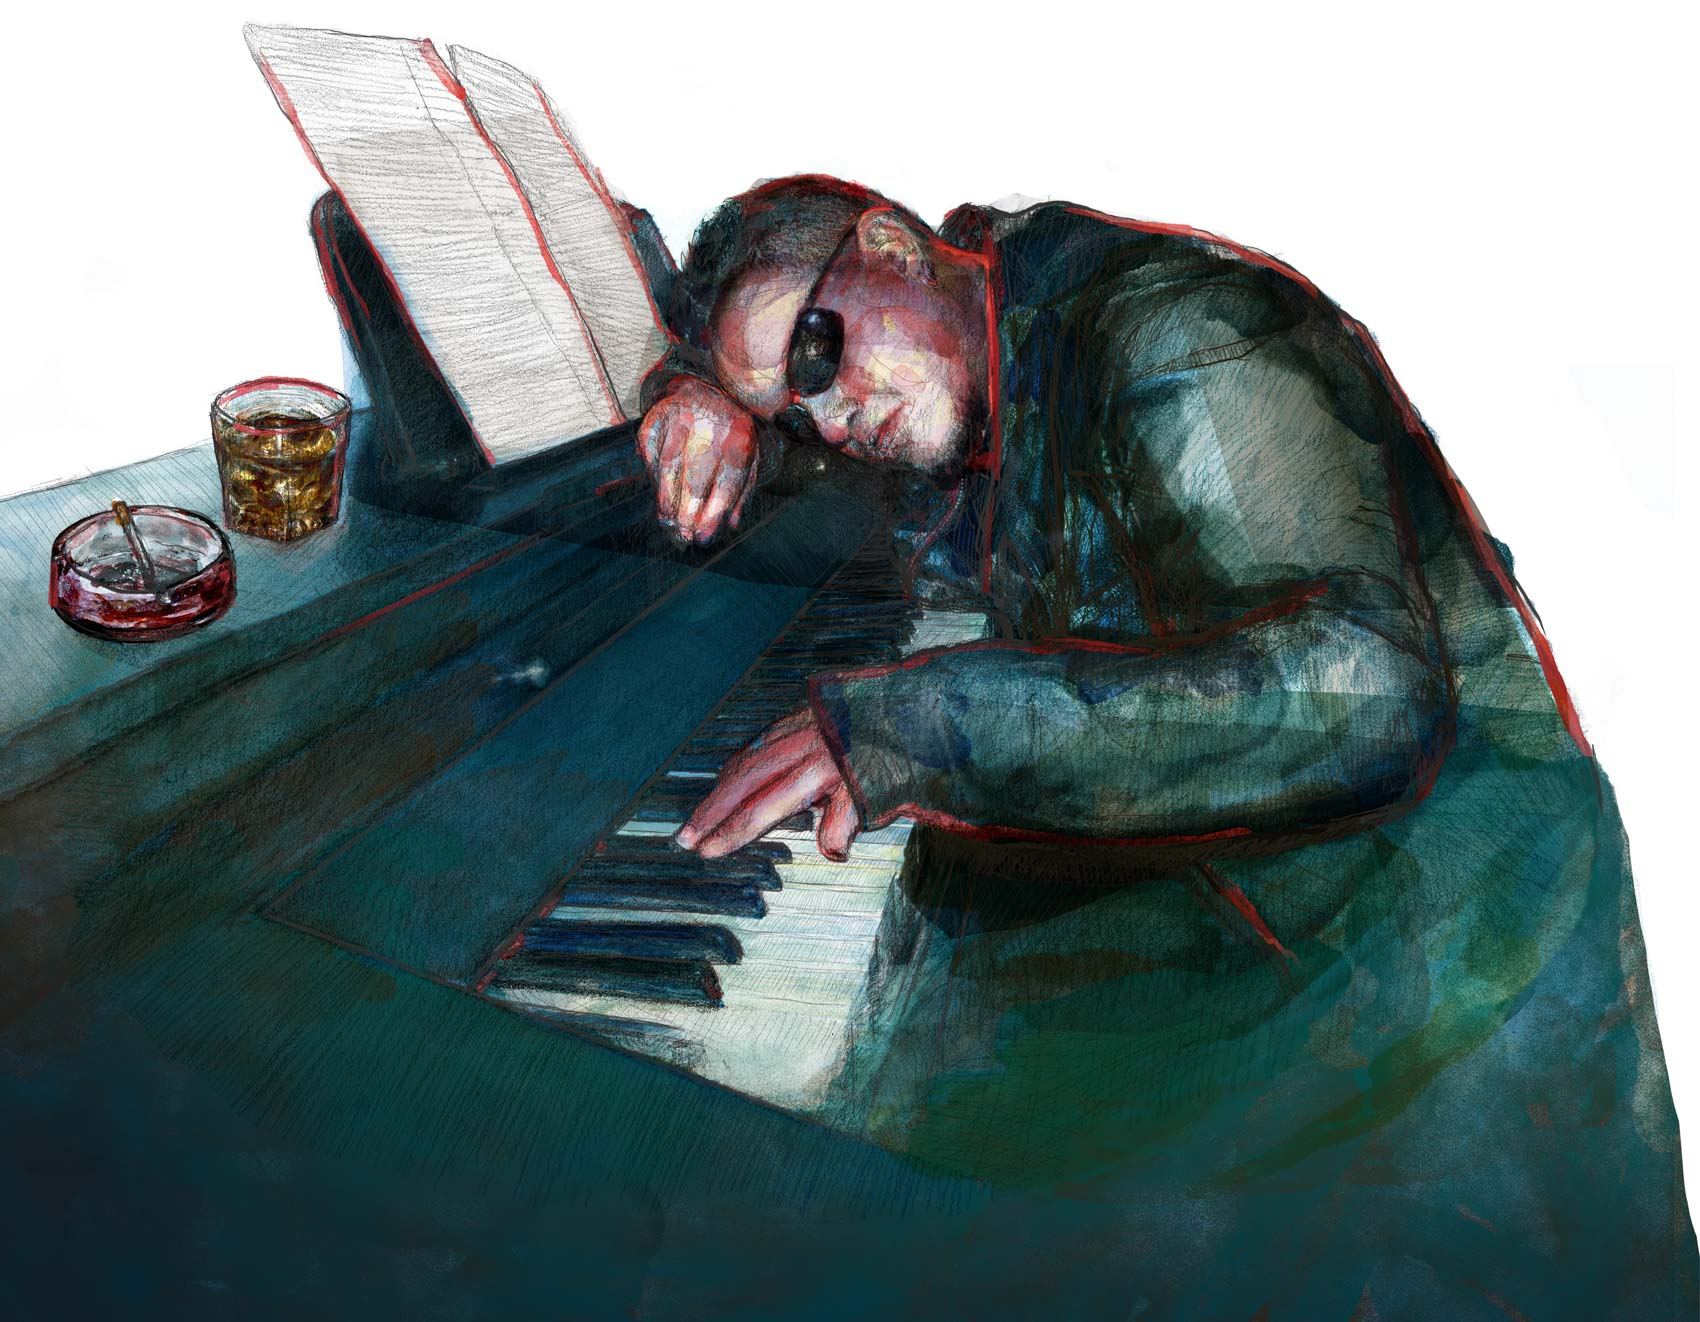 Mario Jodra illustration - The pianist